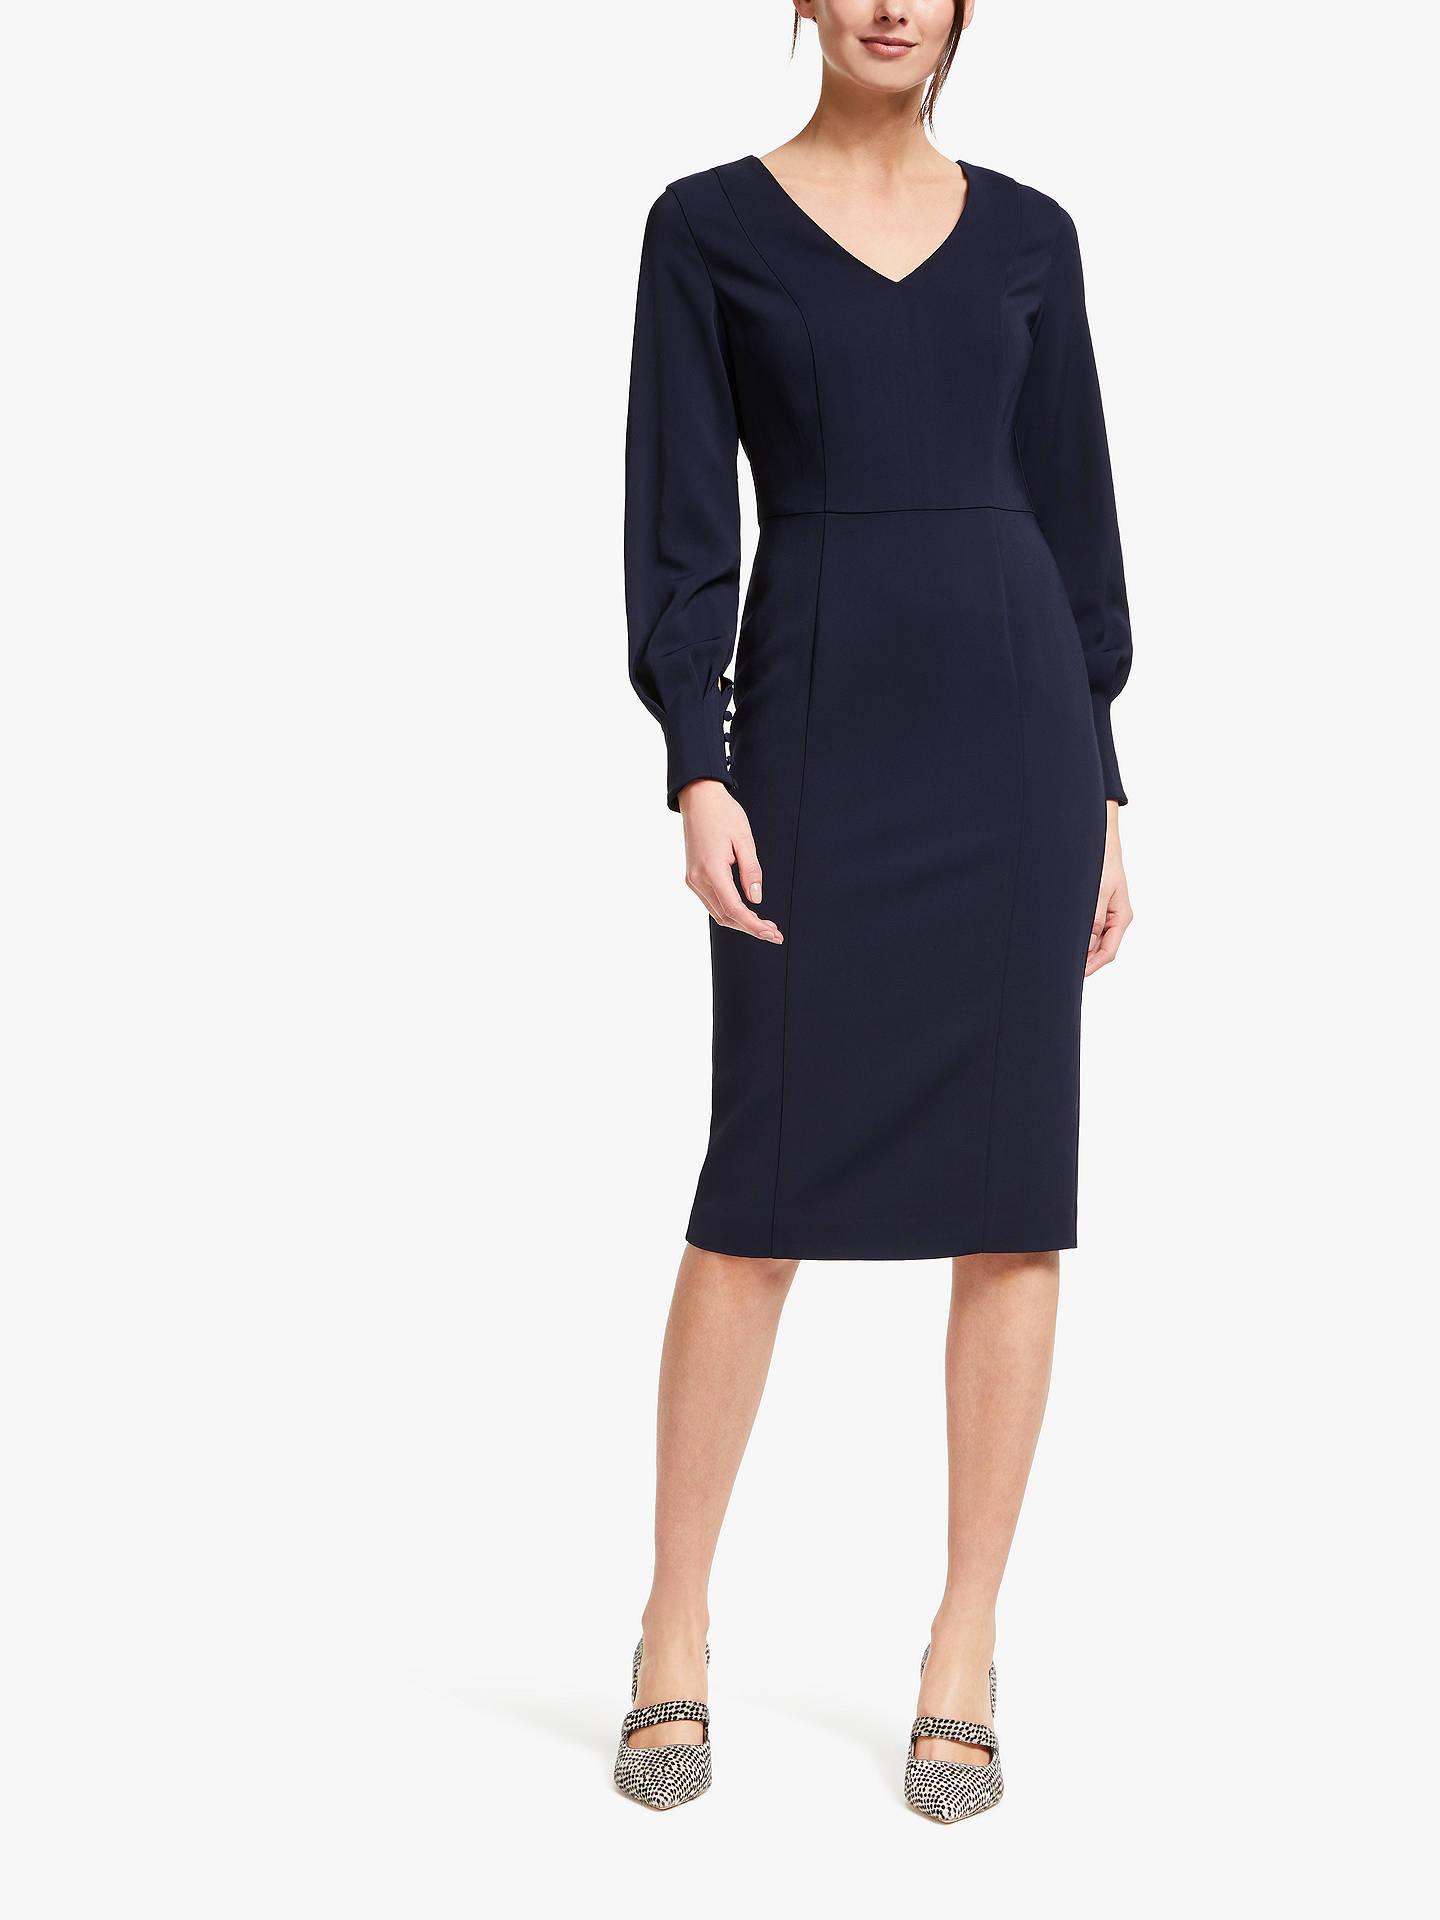 c745bda48e1 Buy Boden Hannah Dress, Navy, 8 Online at johnlewis.com ...